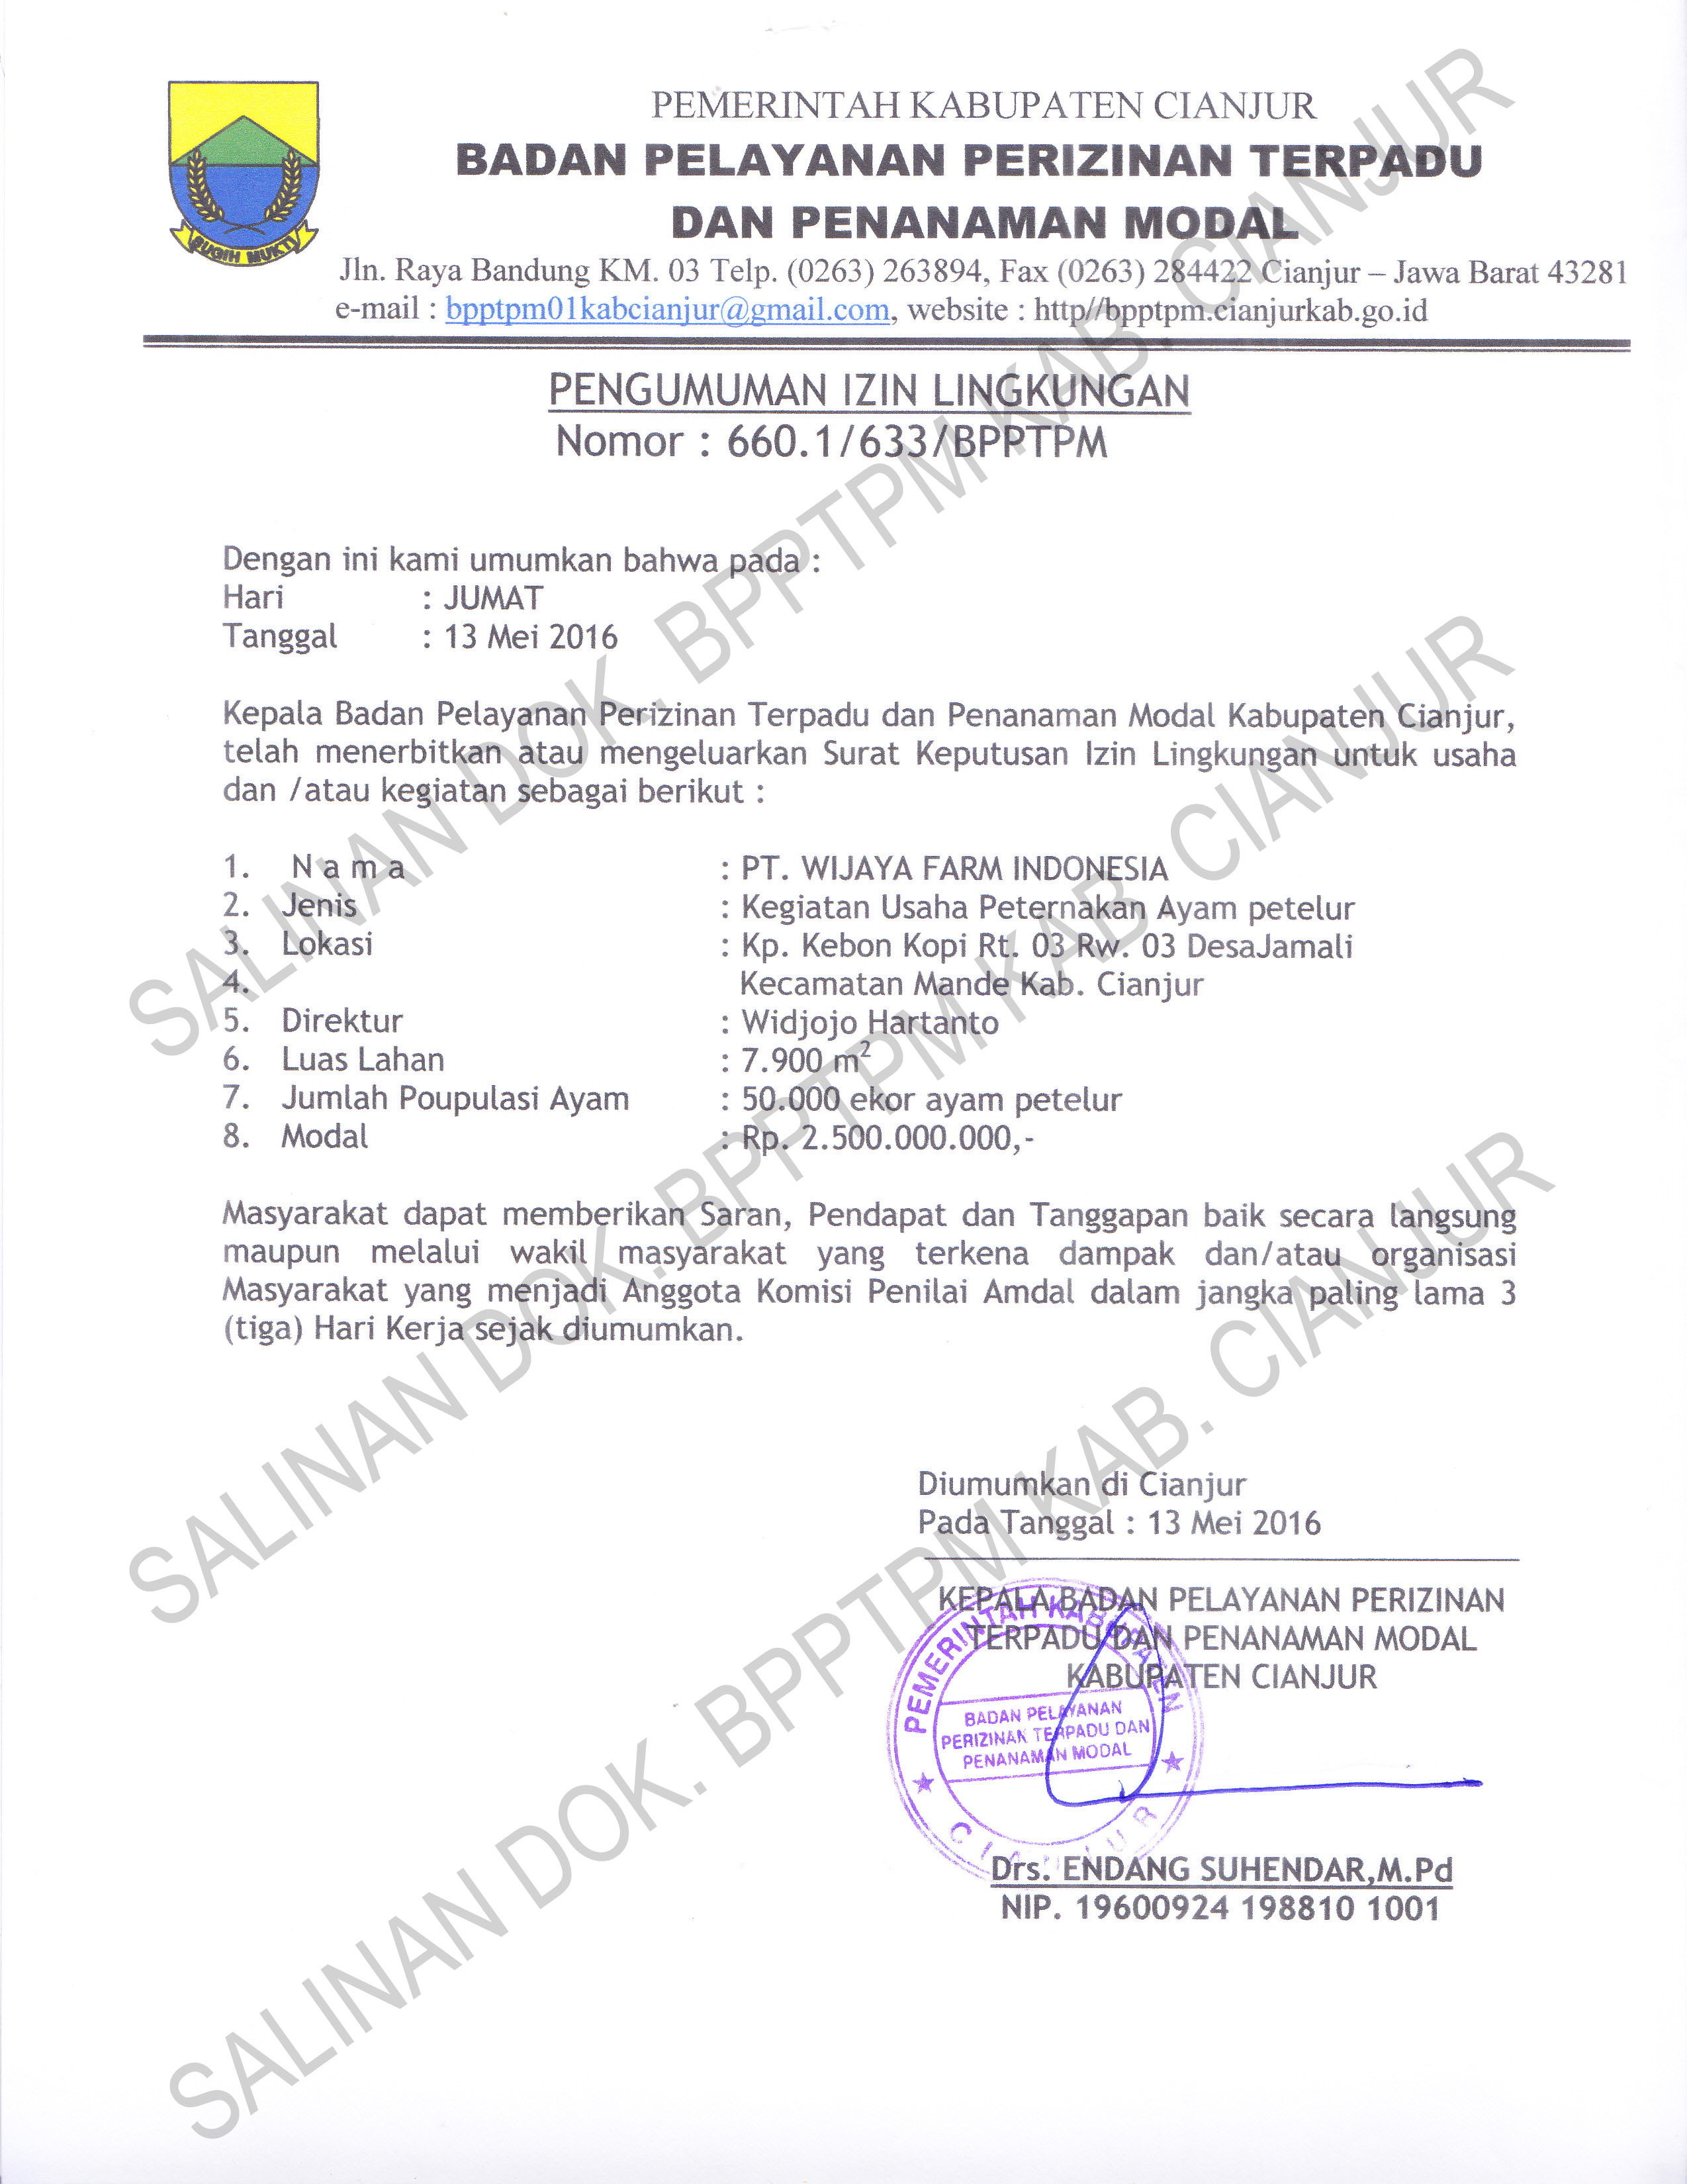 izin-lingkungan-pt-wijaya-farm-indonesia